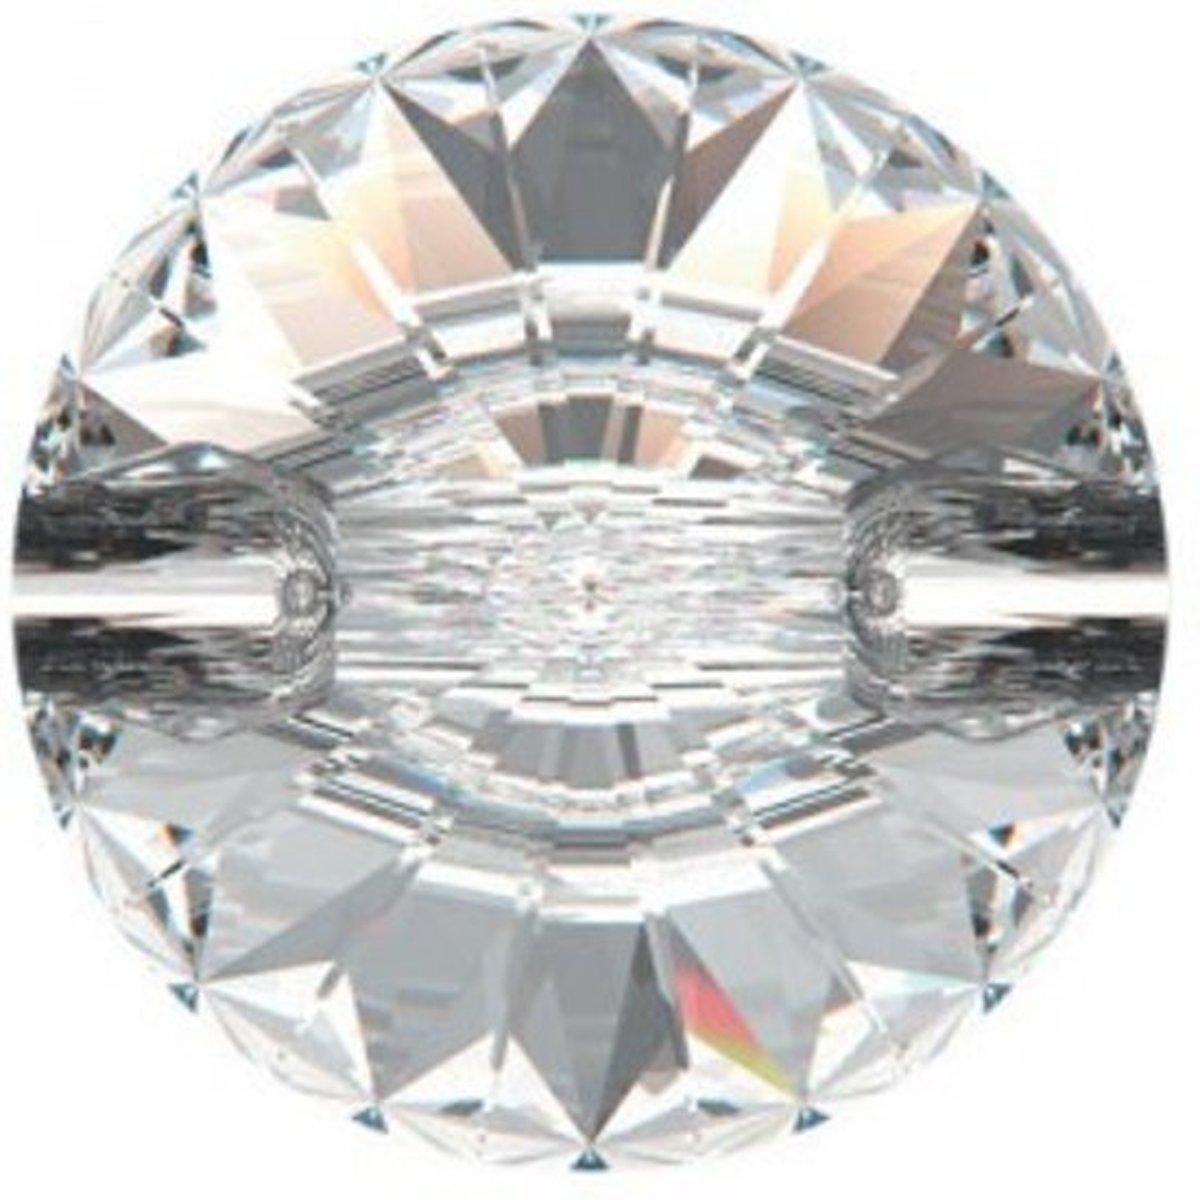 Swarovski knoop 16 mm per 6 stuks ( art. 3015 ) kopen